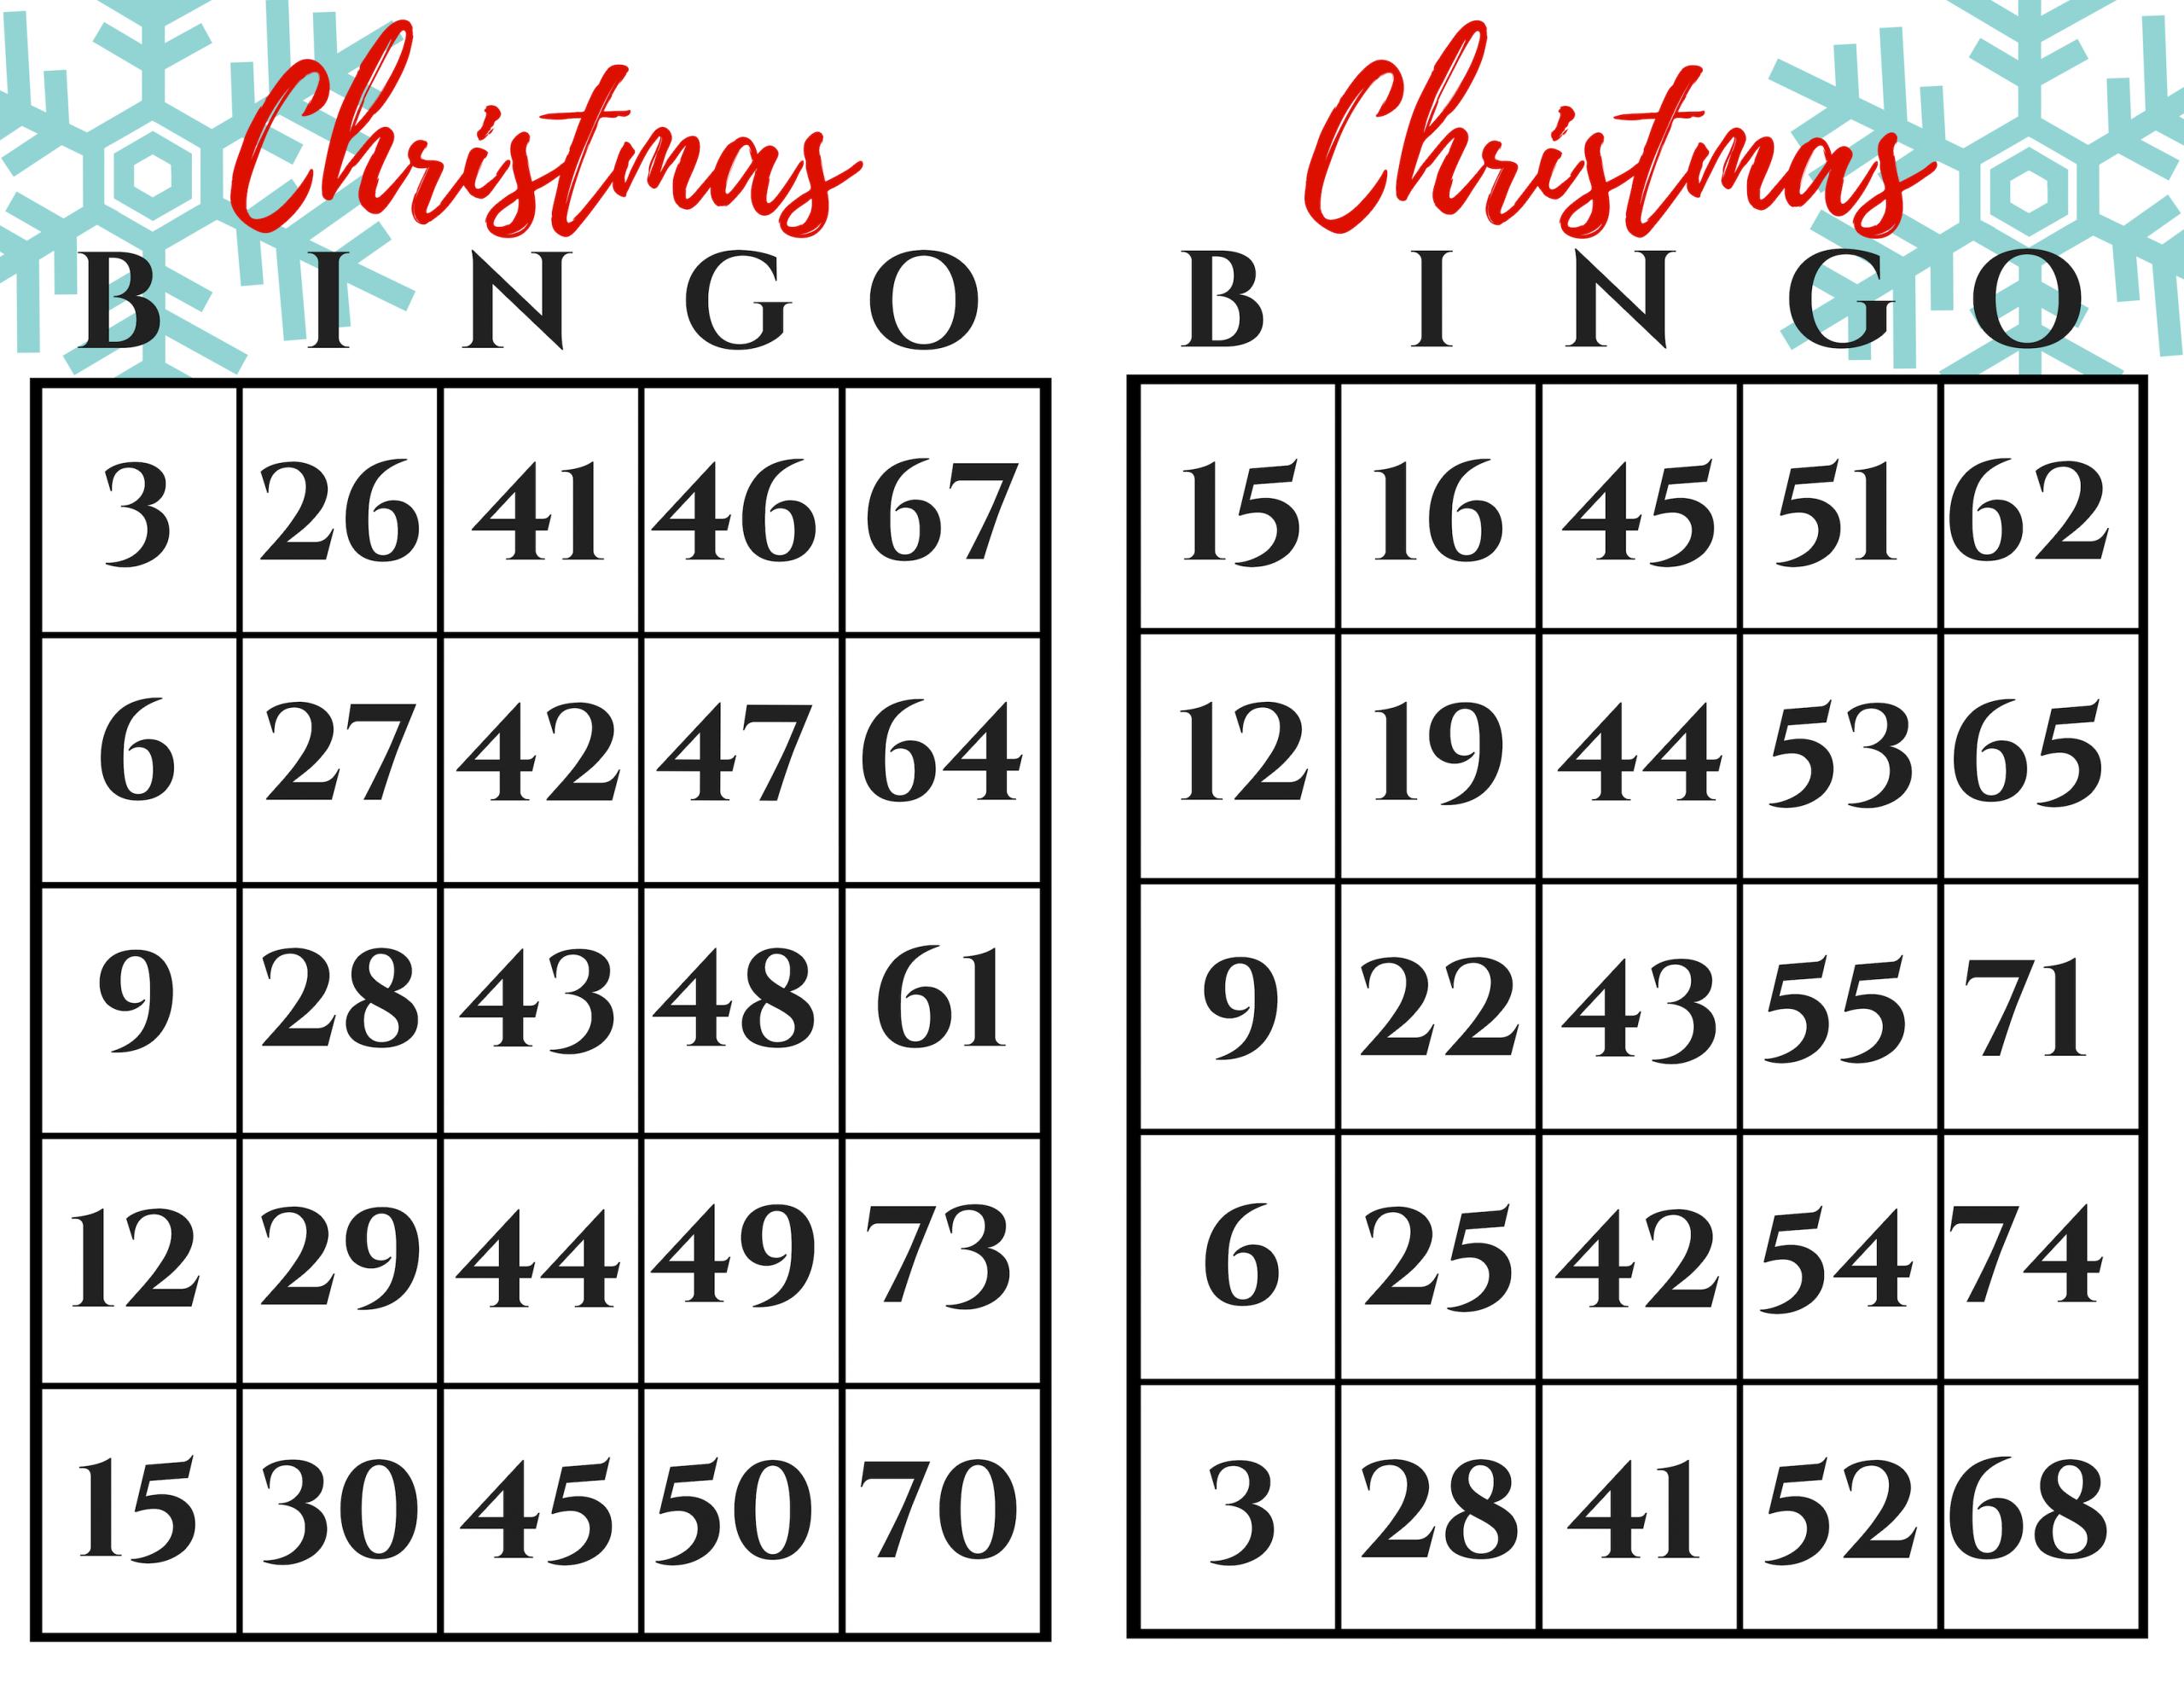 Christmas Bingo Gift Exchange Game - December Pin Challenge